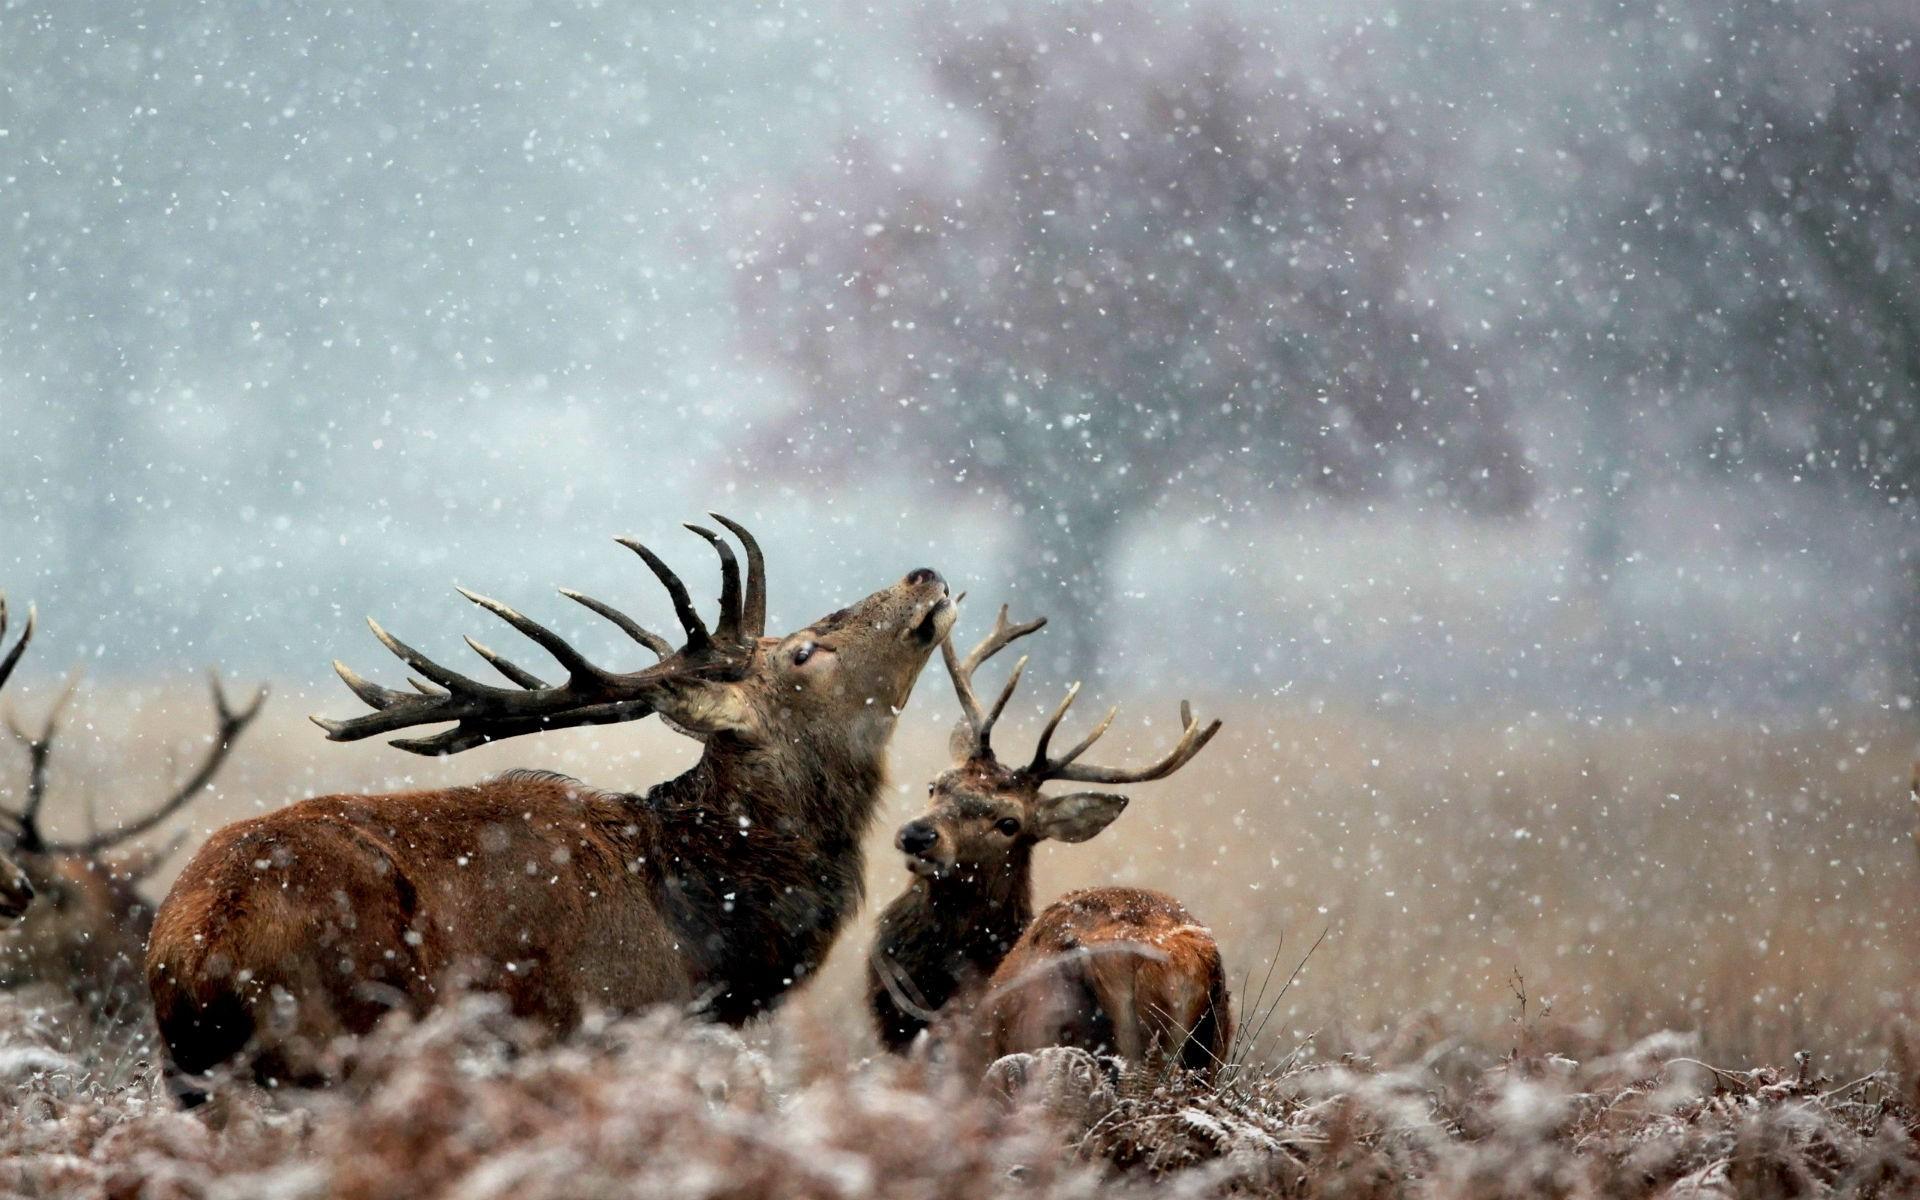 Res: 1920x1200, Amazing Deer Animal On Snowfall Wallpaper Desktop Images Background Photos  Download HD Windows Wallpaper Samsung Iphone Mac